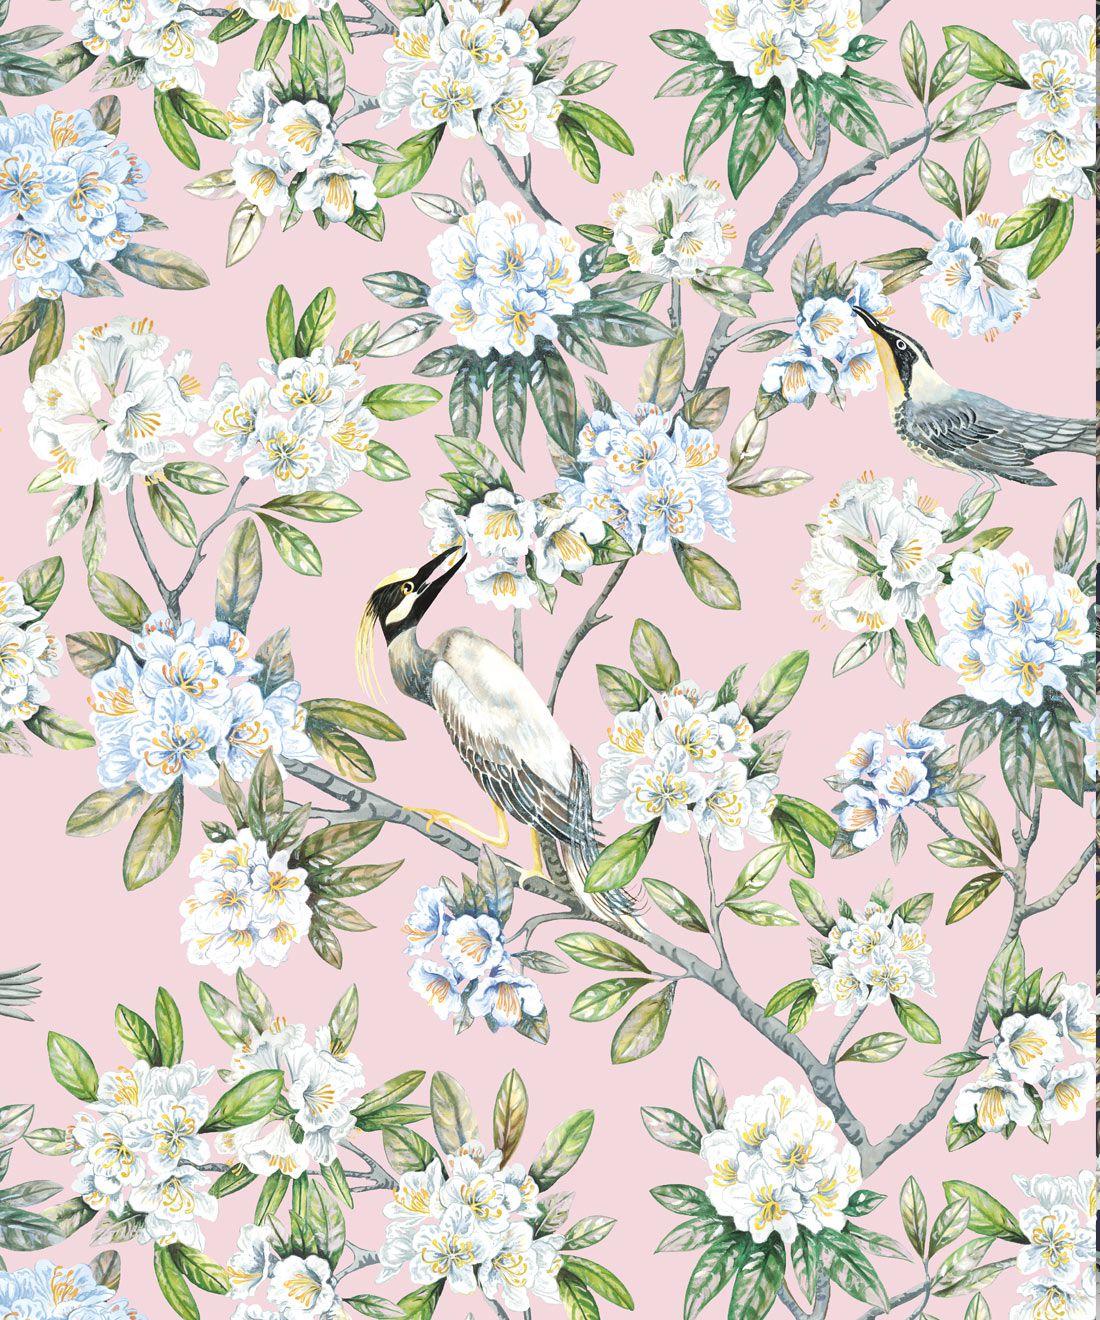 Victoria Wallpaper • Floral Wallpaper • Pink Wallpaper • Swatch